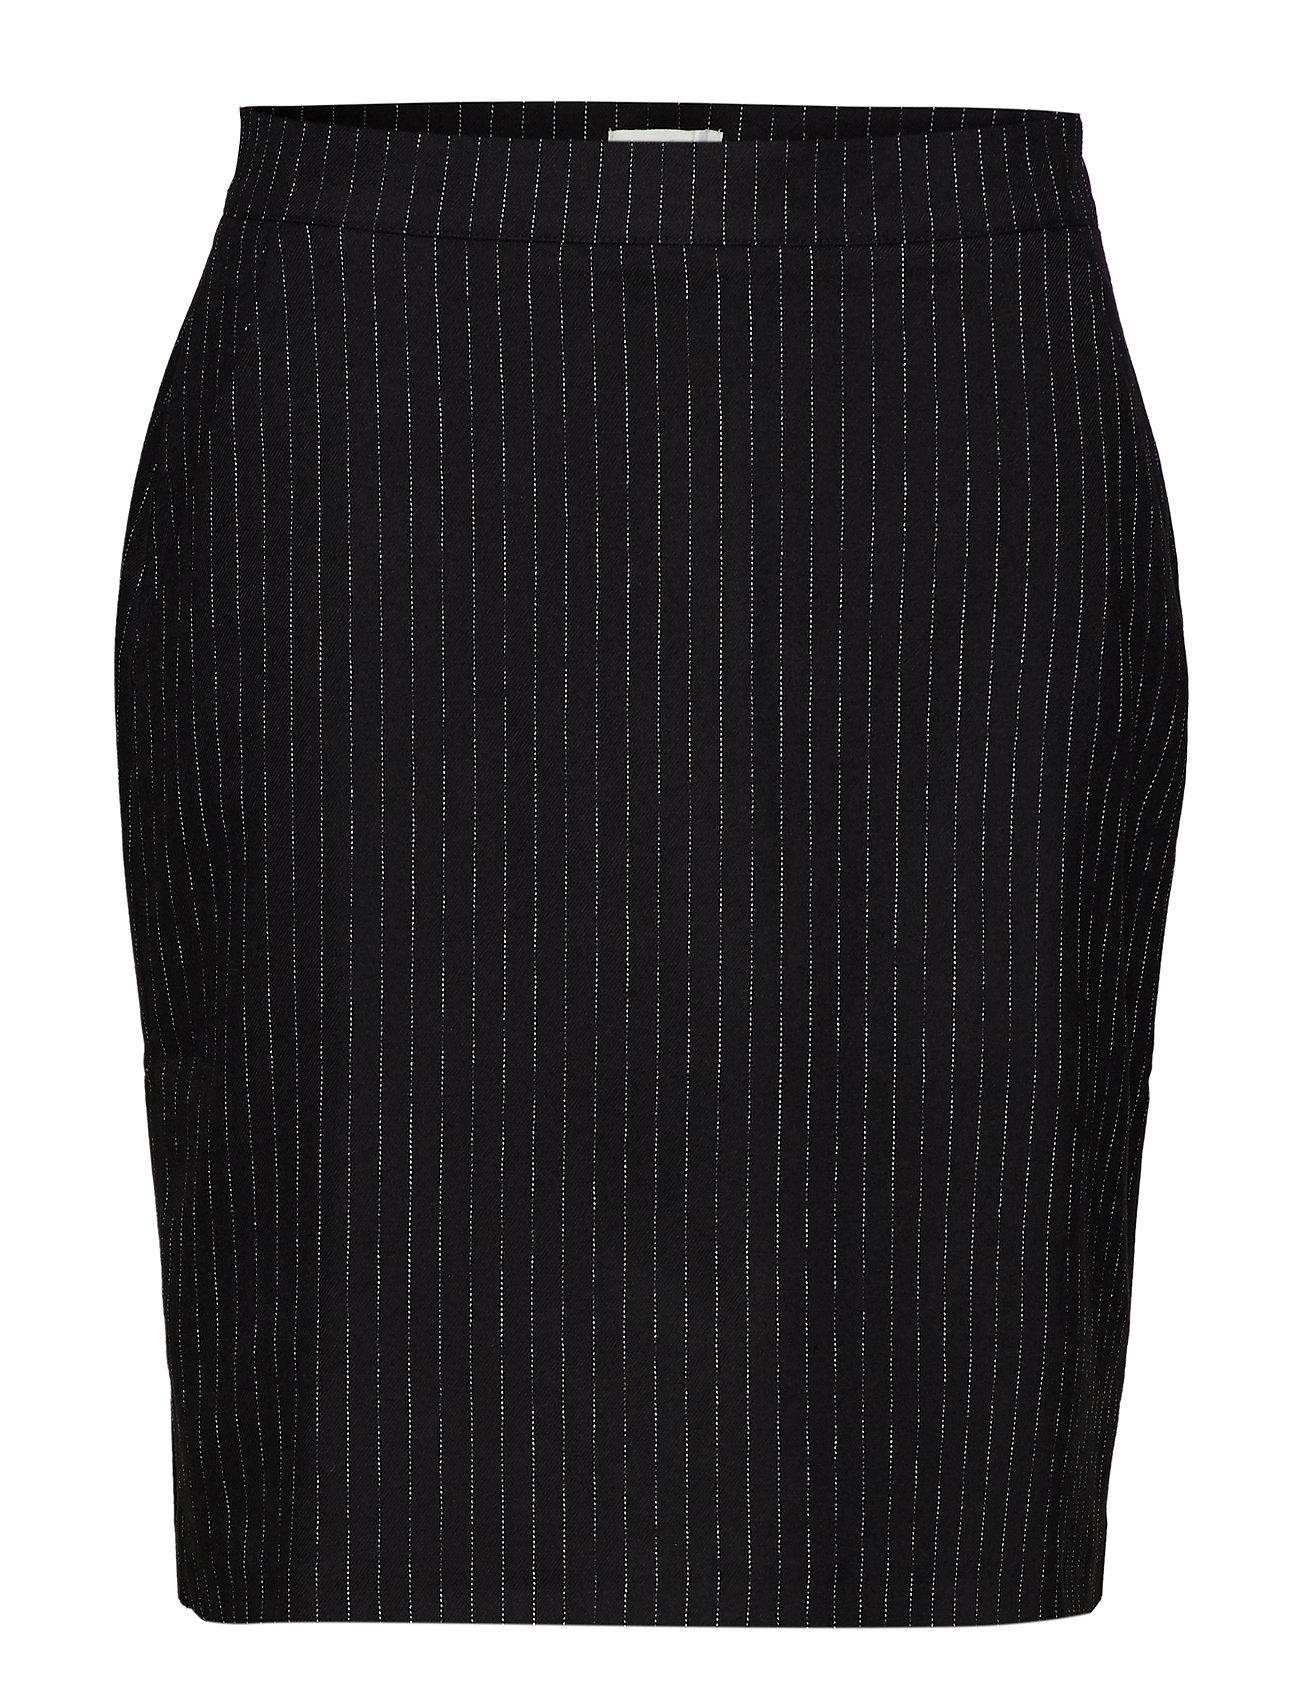 Signal Skirt - BLACK